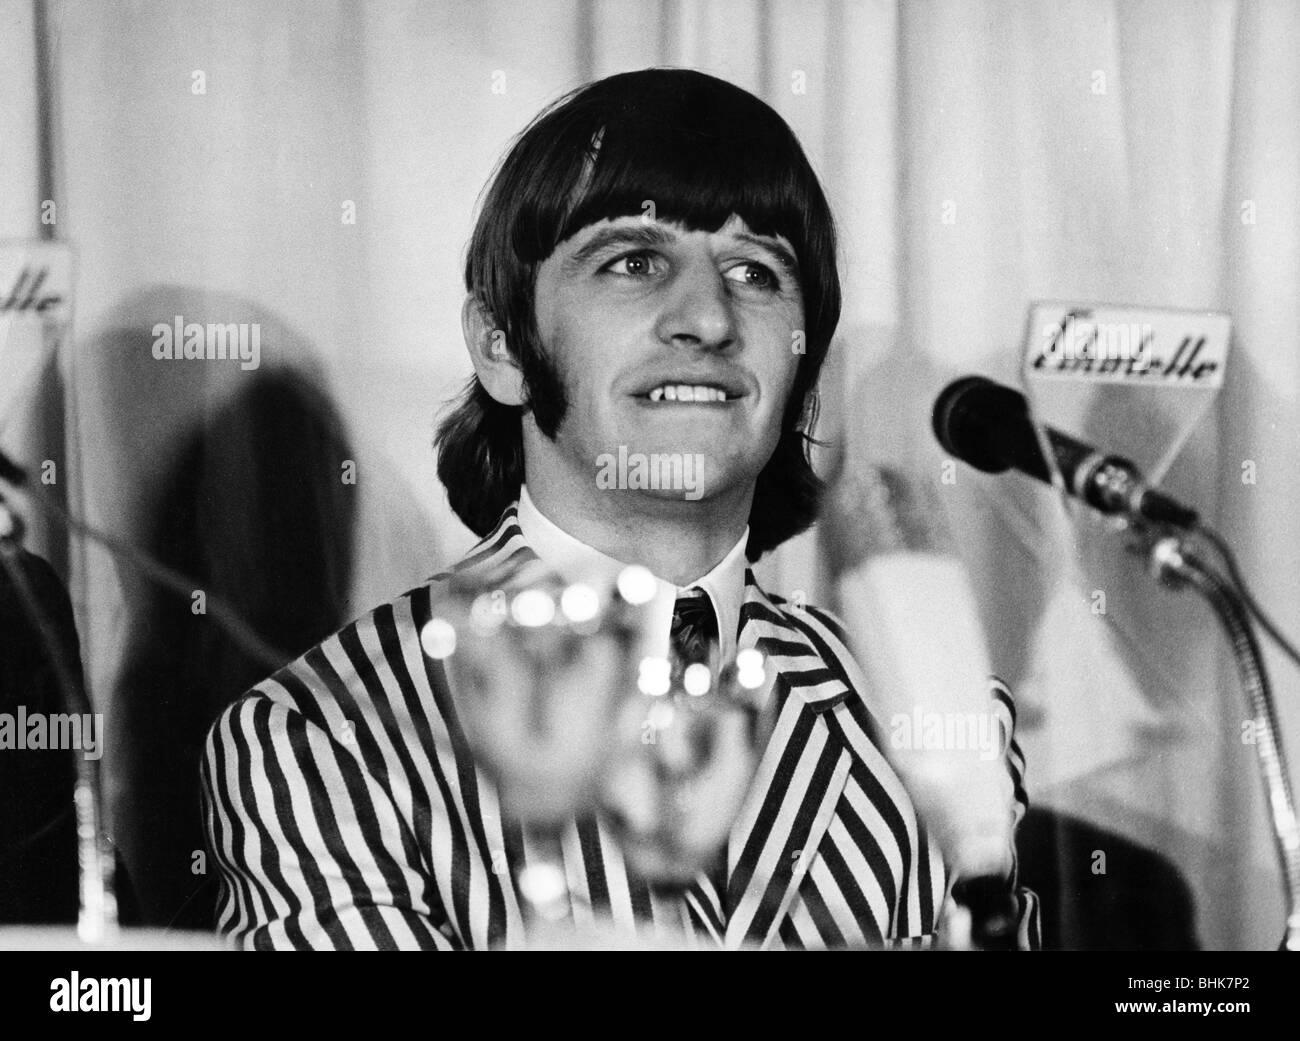 Beatles, 1960 - 1970, British rock band, Ringo Starr, conference, 'Bravo Blitz Tour', Munich, 24.6.1966, - Stock Image